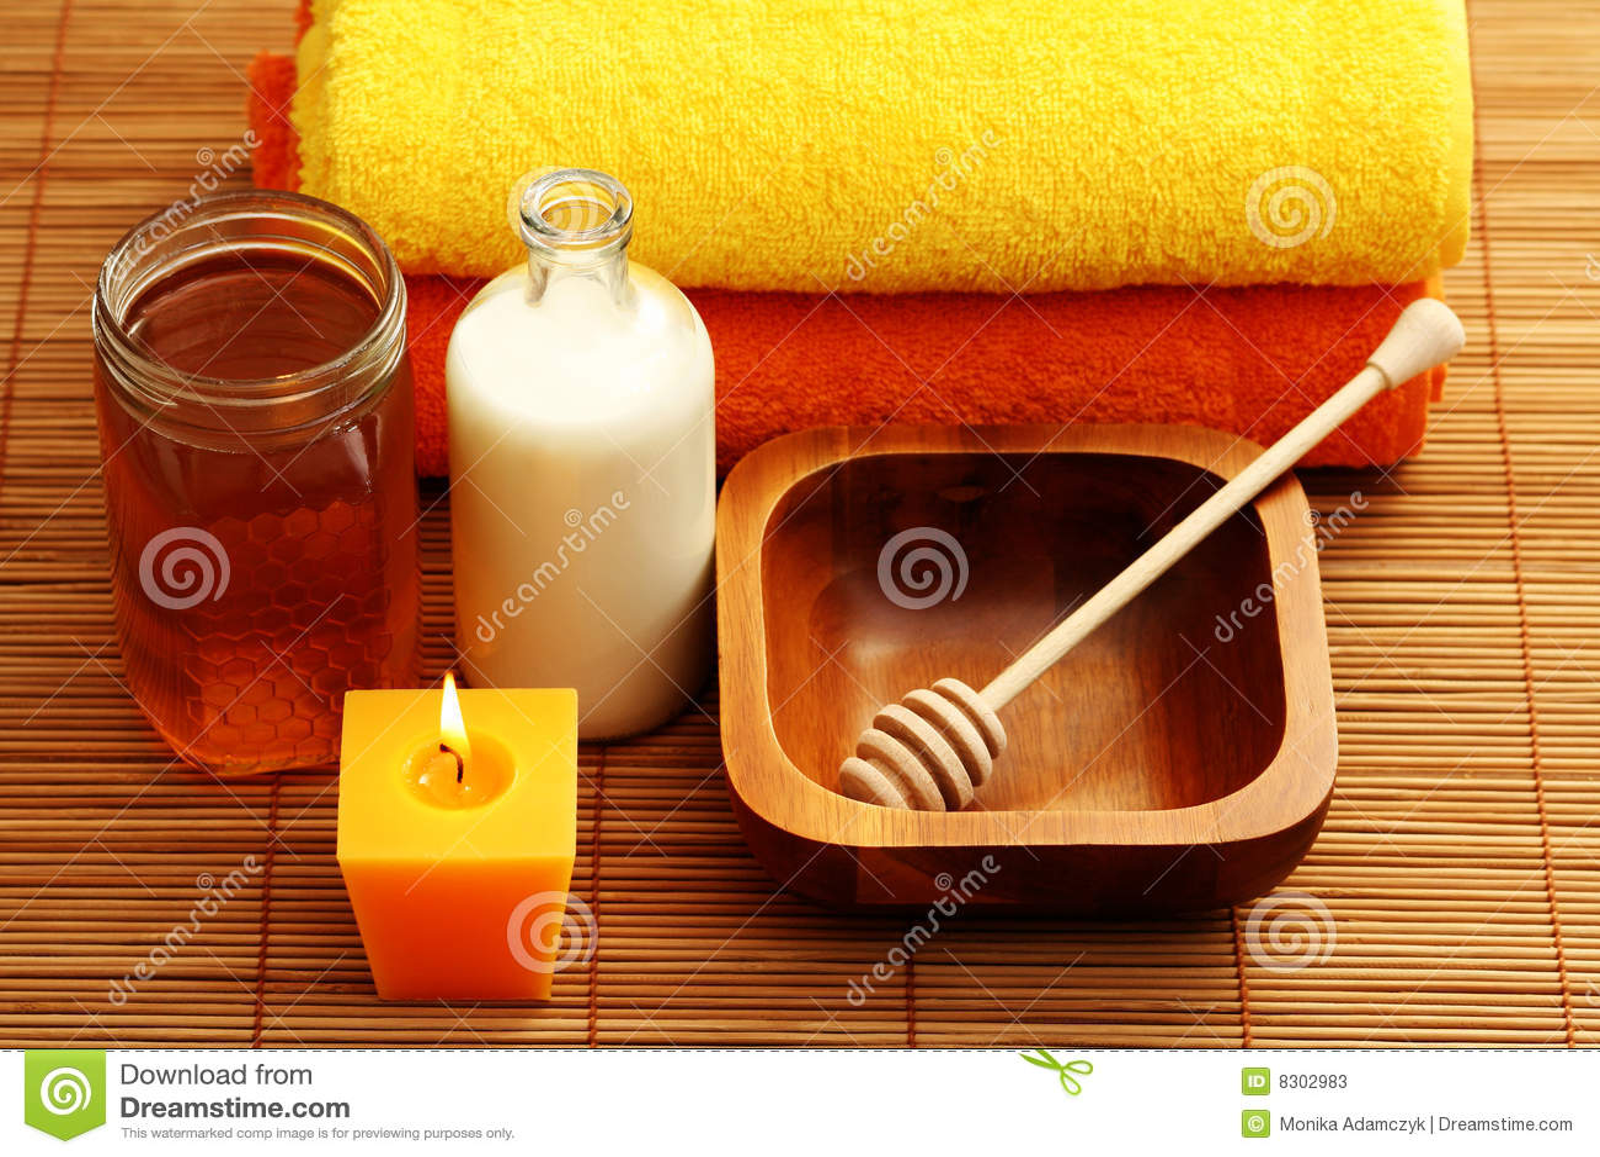 Honey milk spa